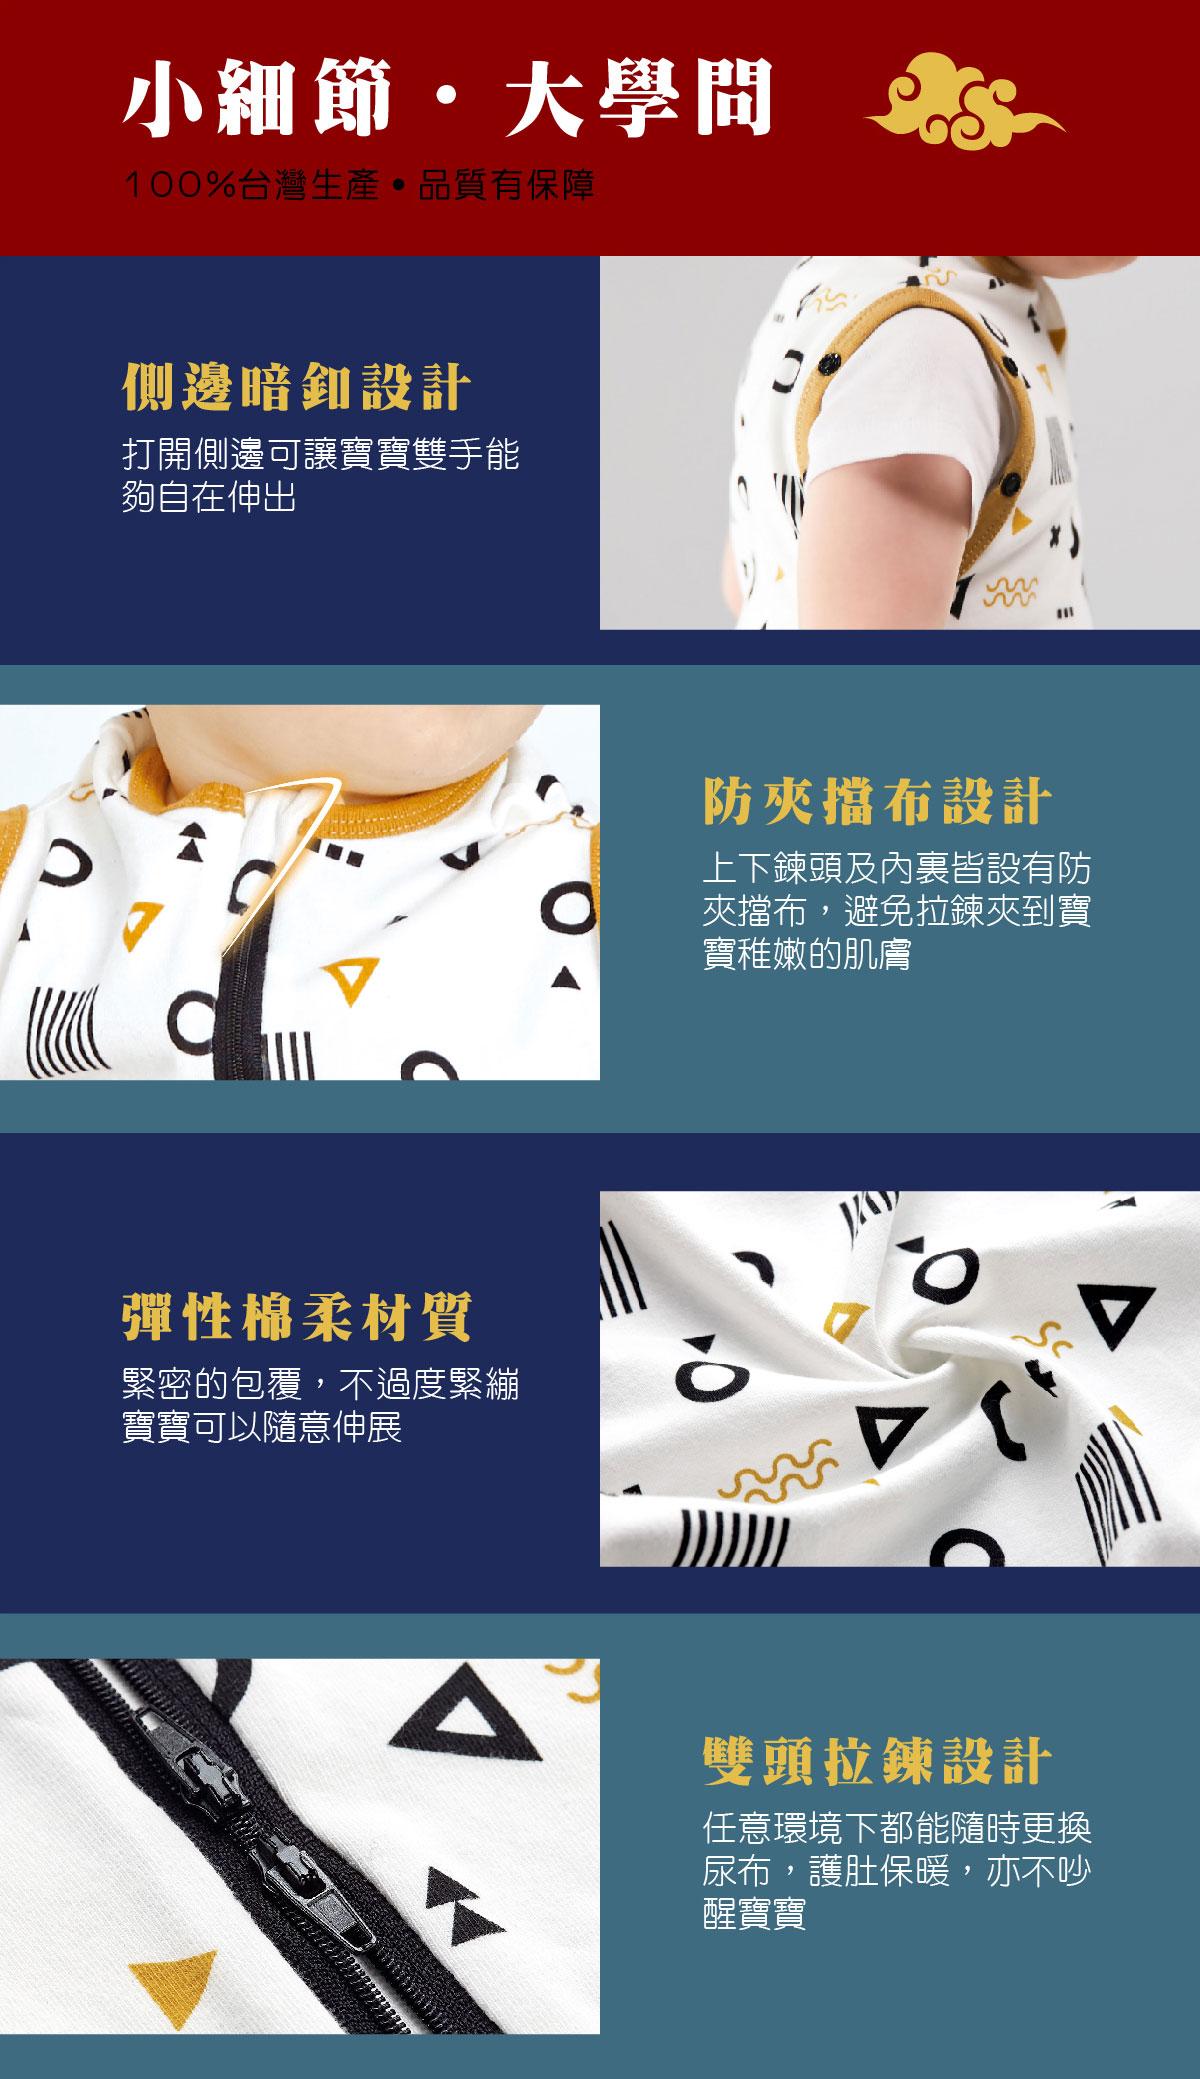 proimages/BeddingSeries/Blankets-Comforter/2542/大甲媽成長包巾-EDM-07.jpg